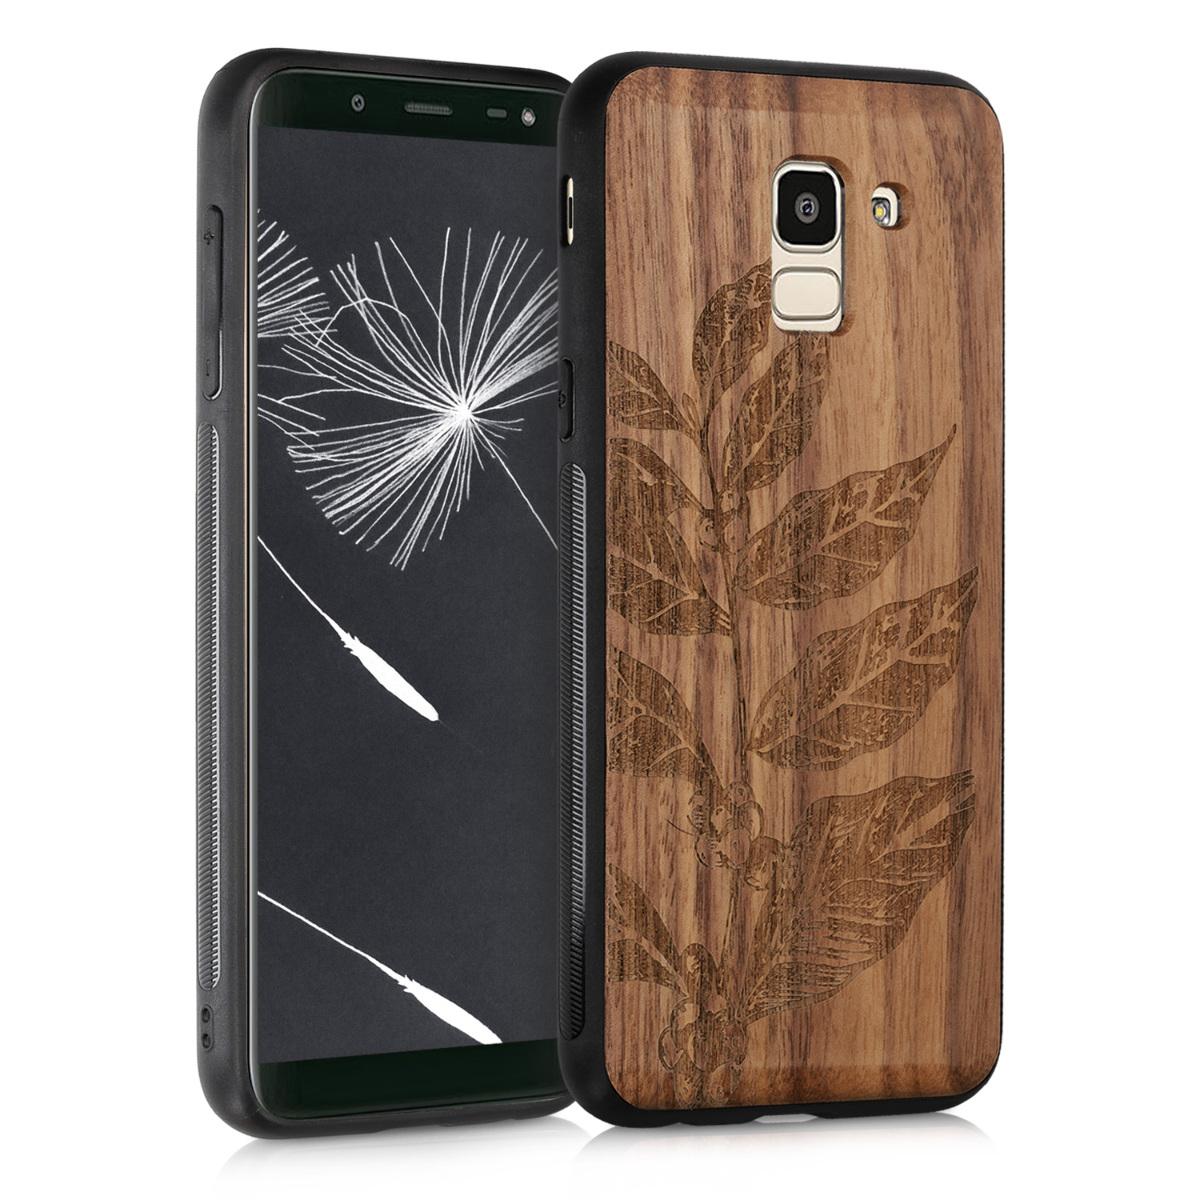 KW Ξύλινη Θήκη Samsung Galaxy J6 2018 - Leaves and Berries (47240.01)